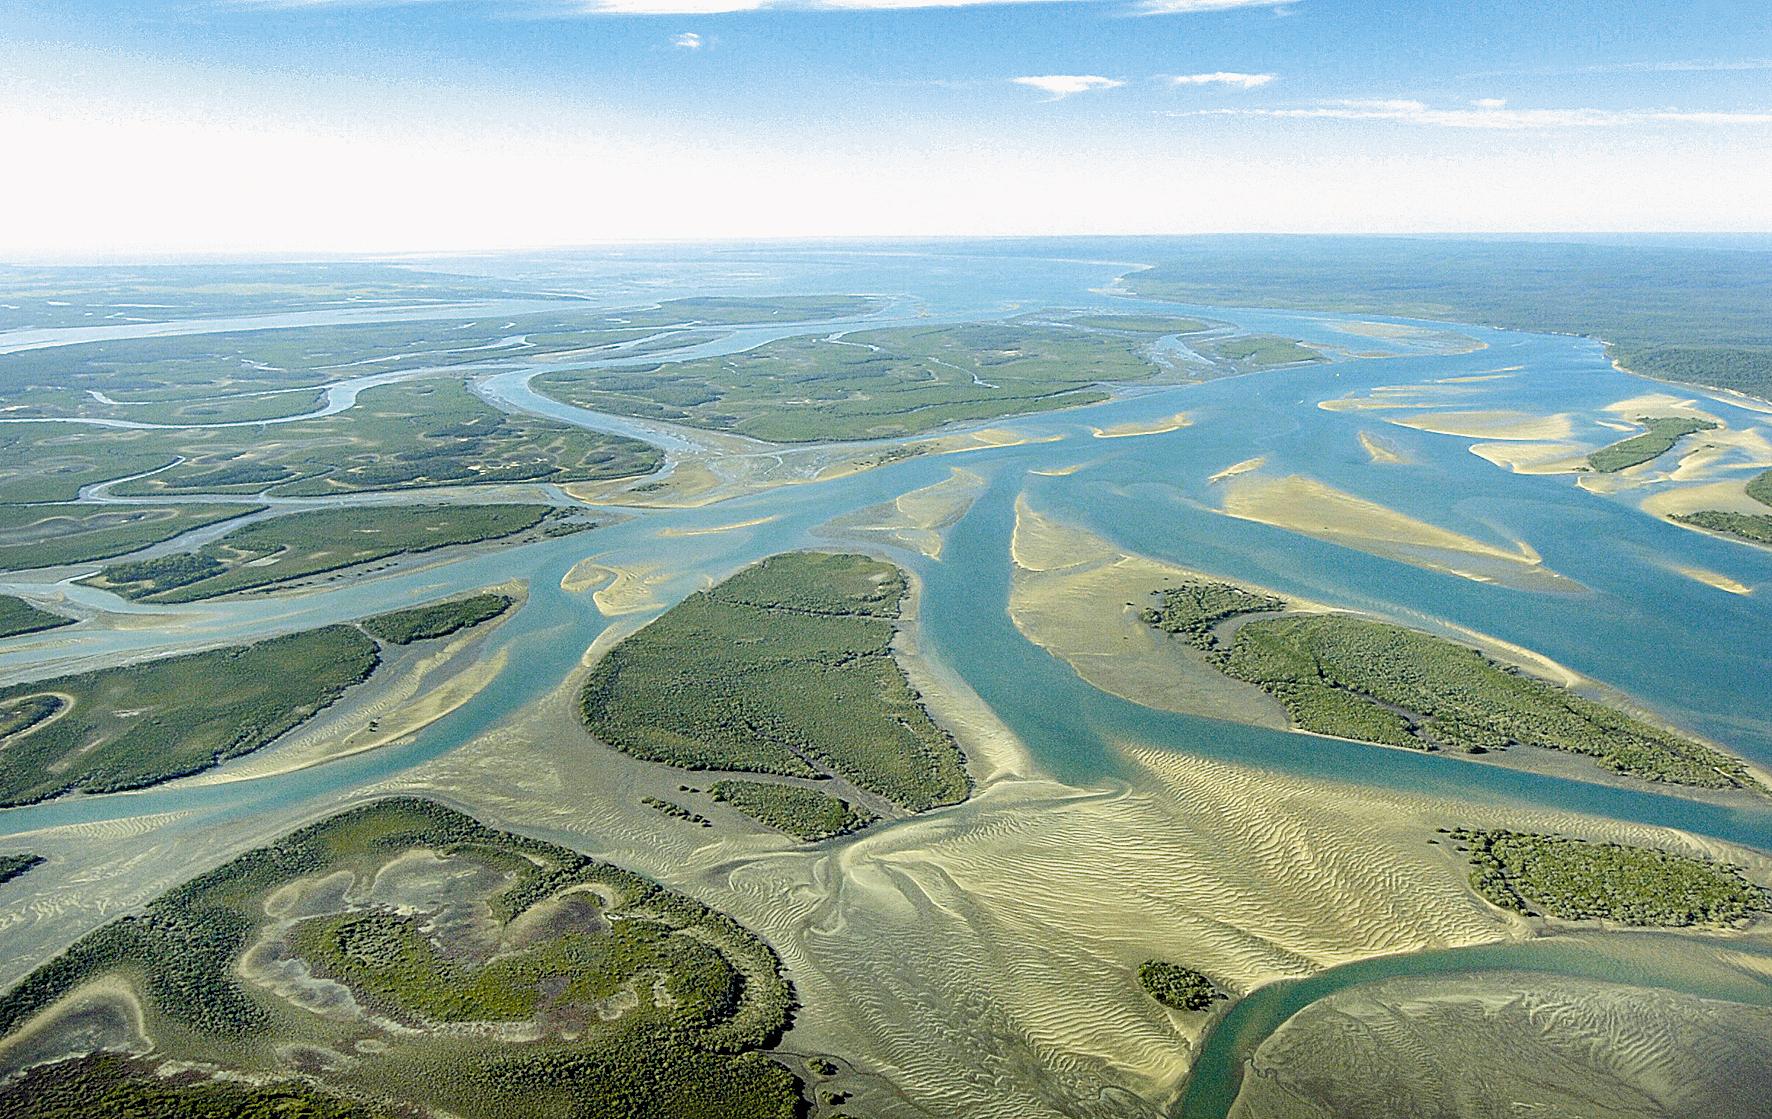 The Great Sandy Strait